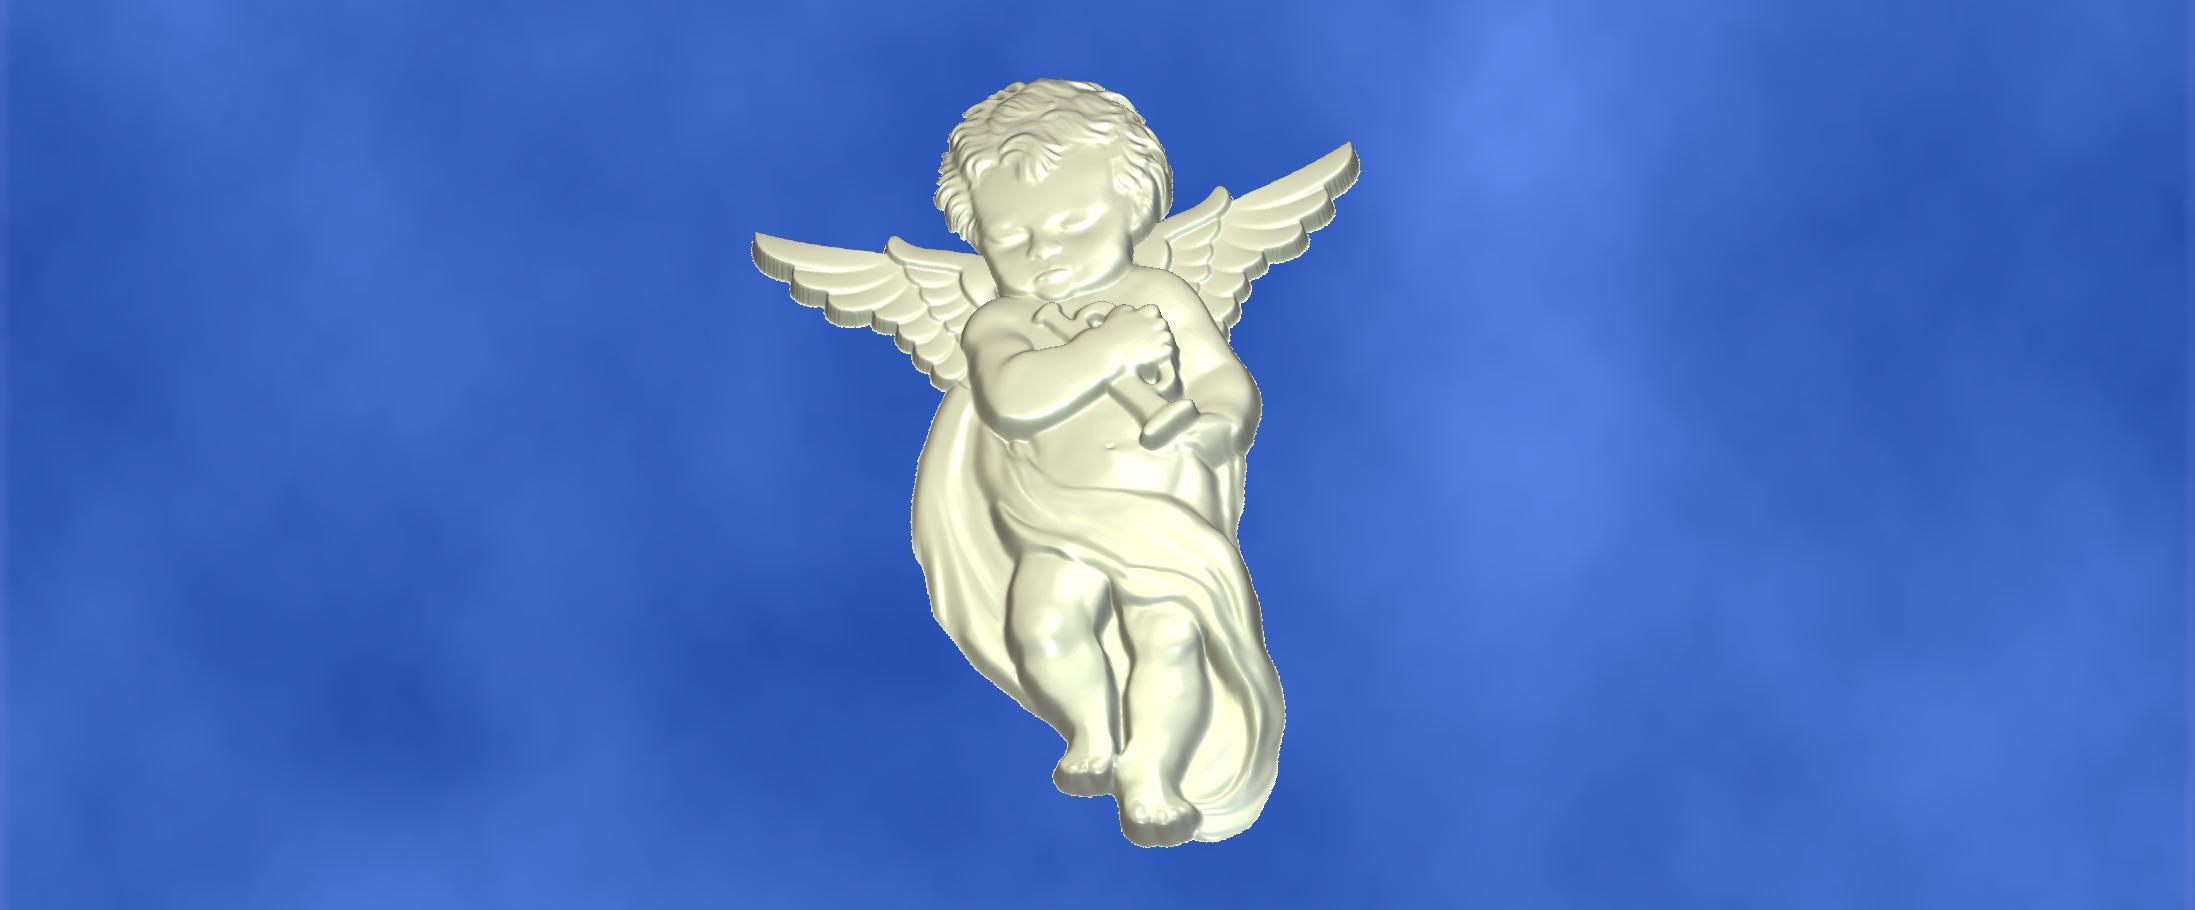 6.jpg Download free STL file 3D STL MODEL CHERUB  • 3D print model, ALPHA_MENA